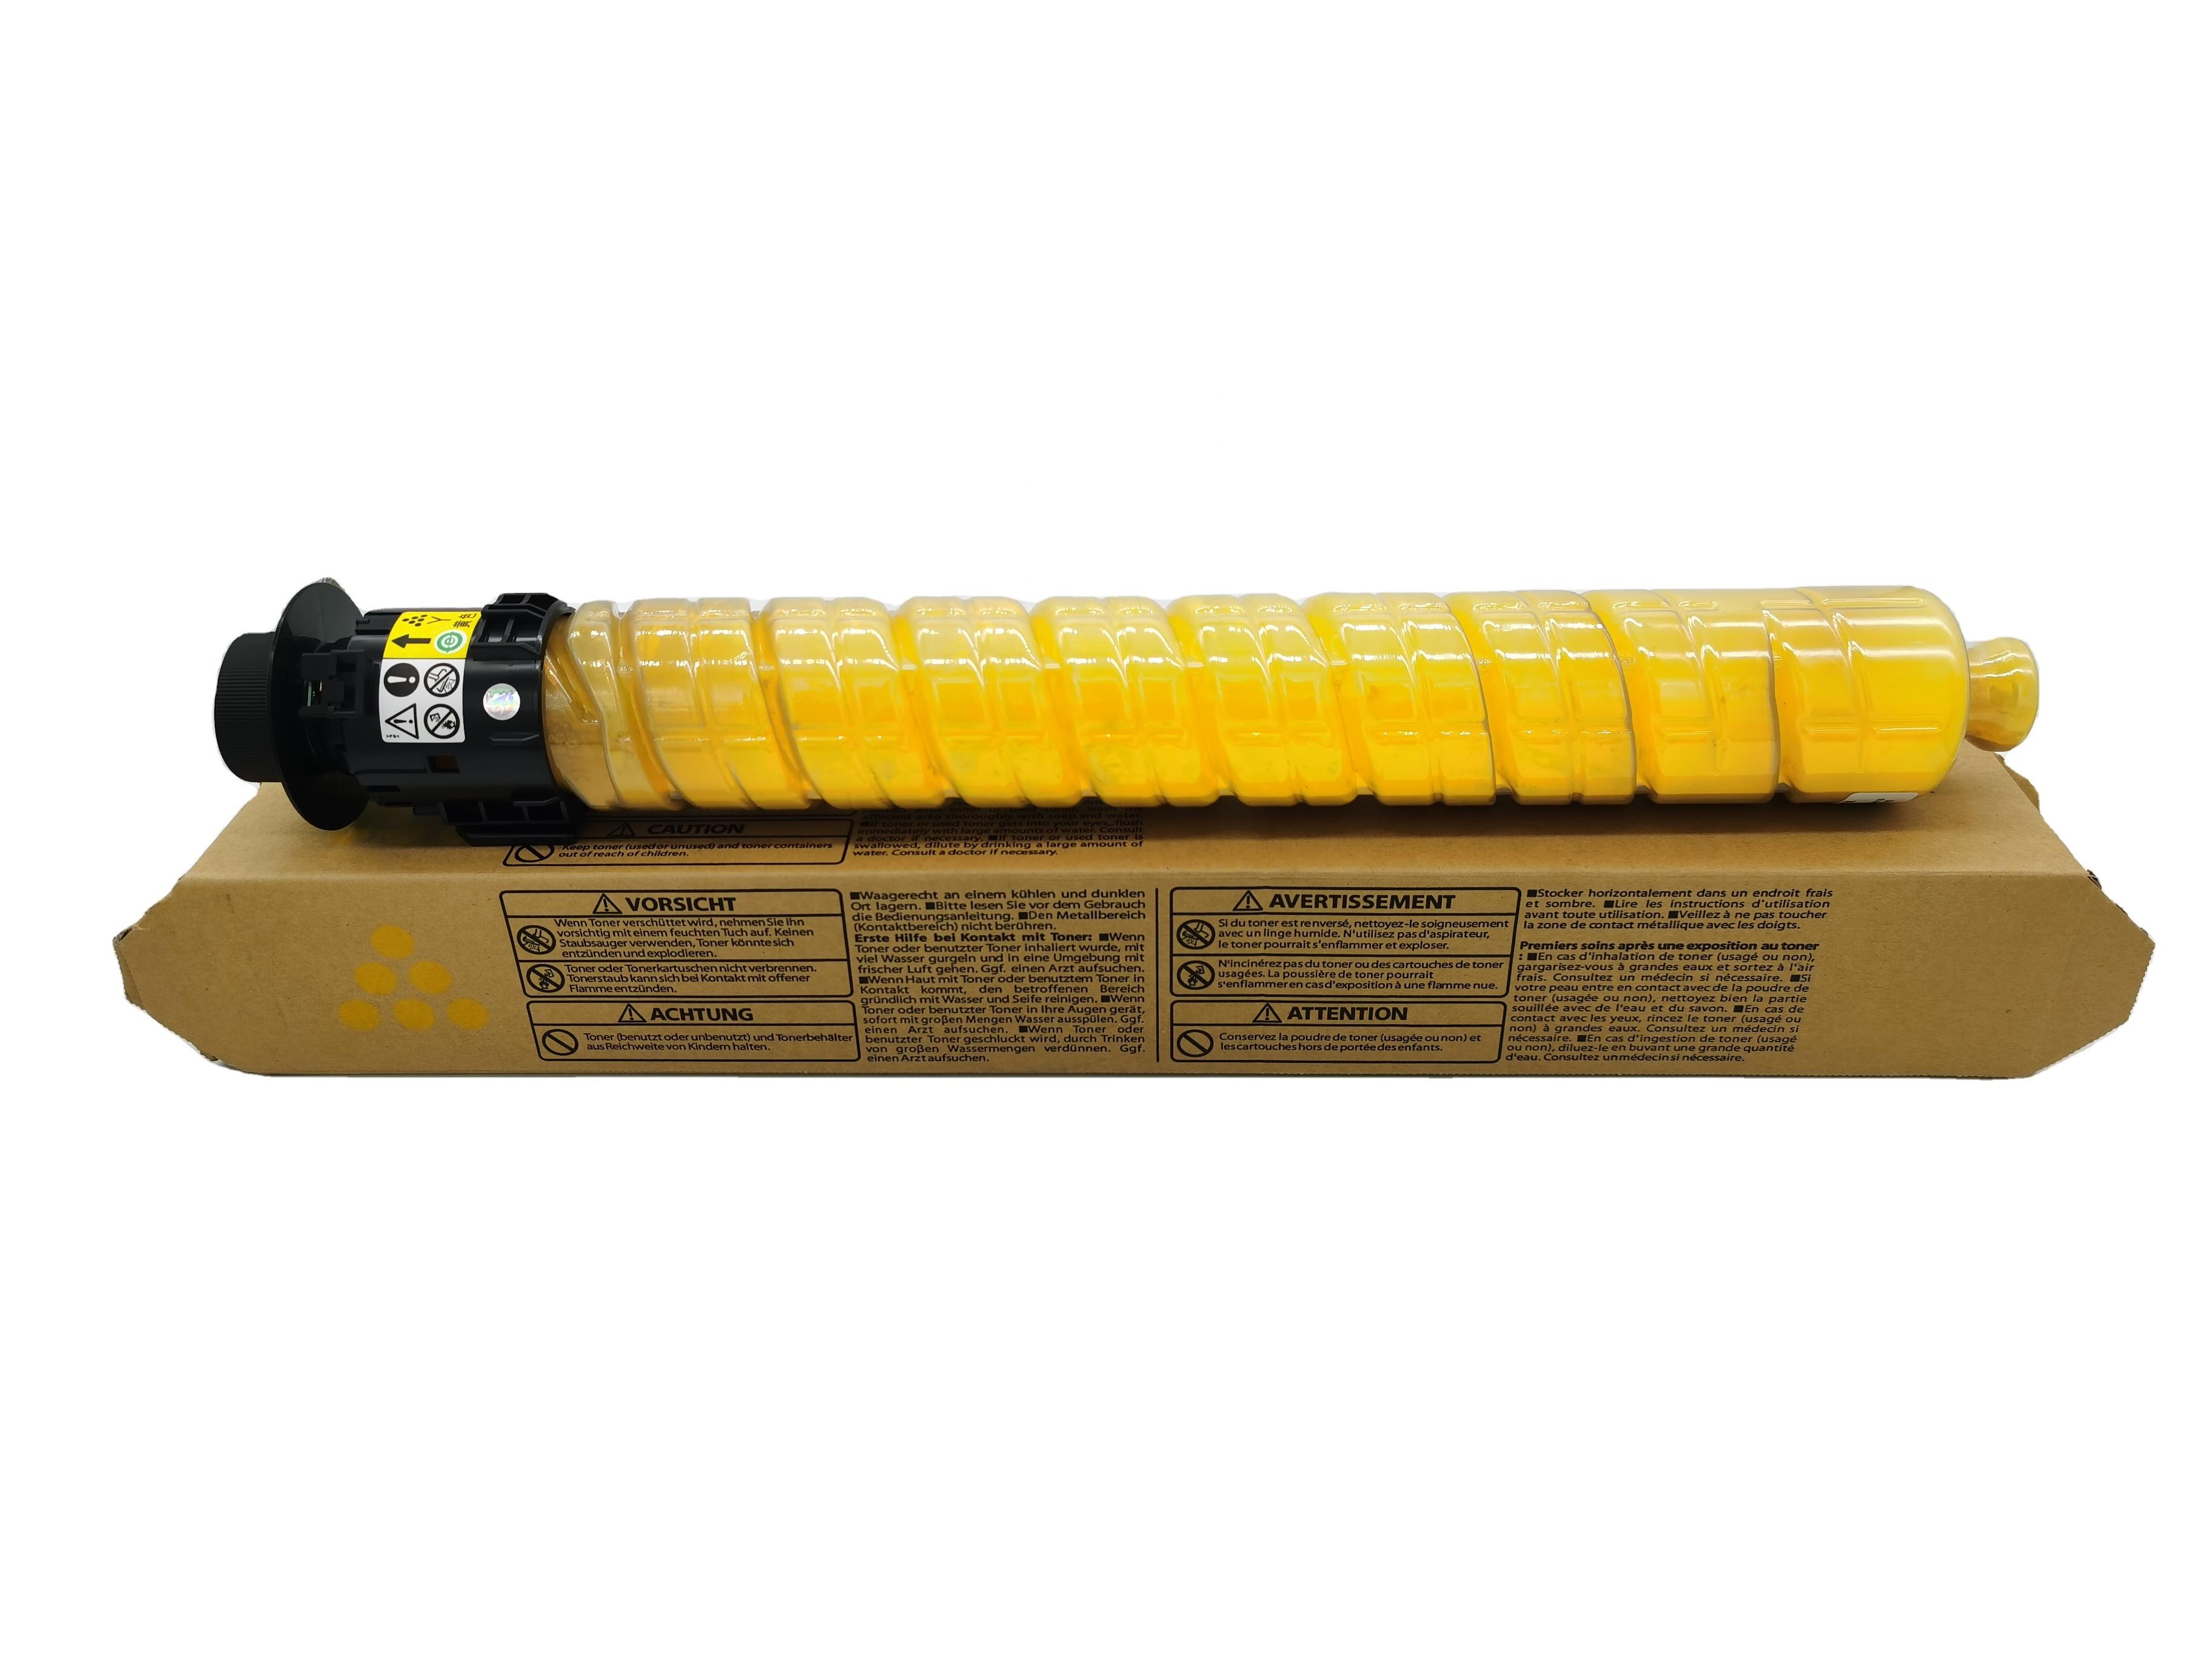 Compatible MPC3501MP 3501 toner cartridge for Ricoh MPC3300 C4000 C5000 C2800 MPC 2800 MPC3501 MP C5501 toner chip